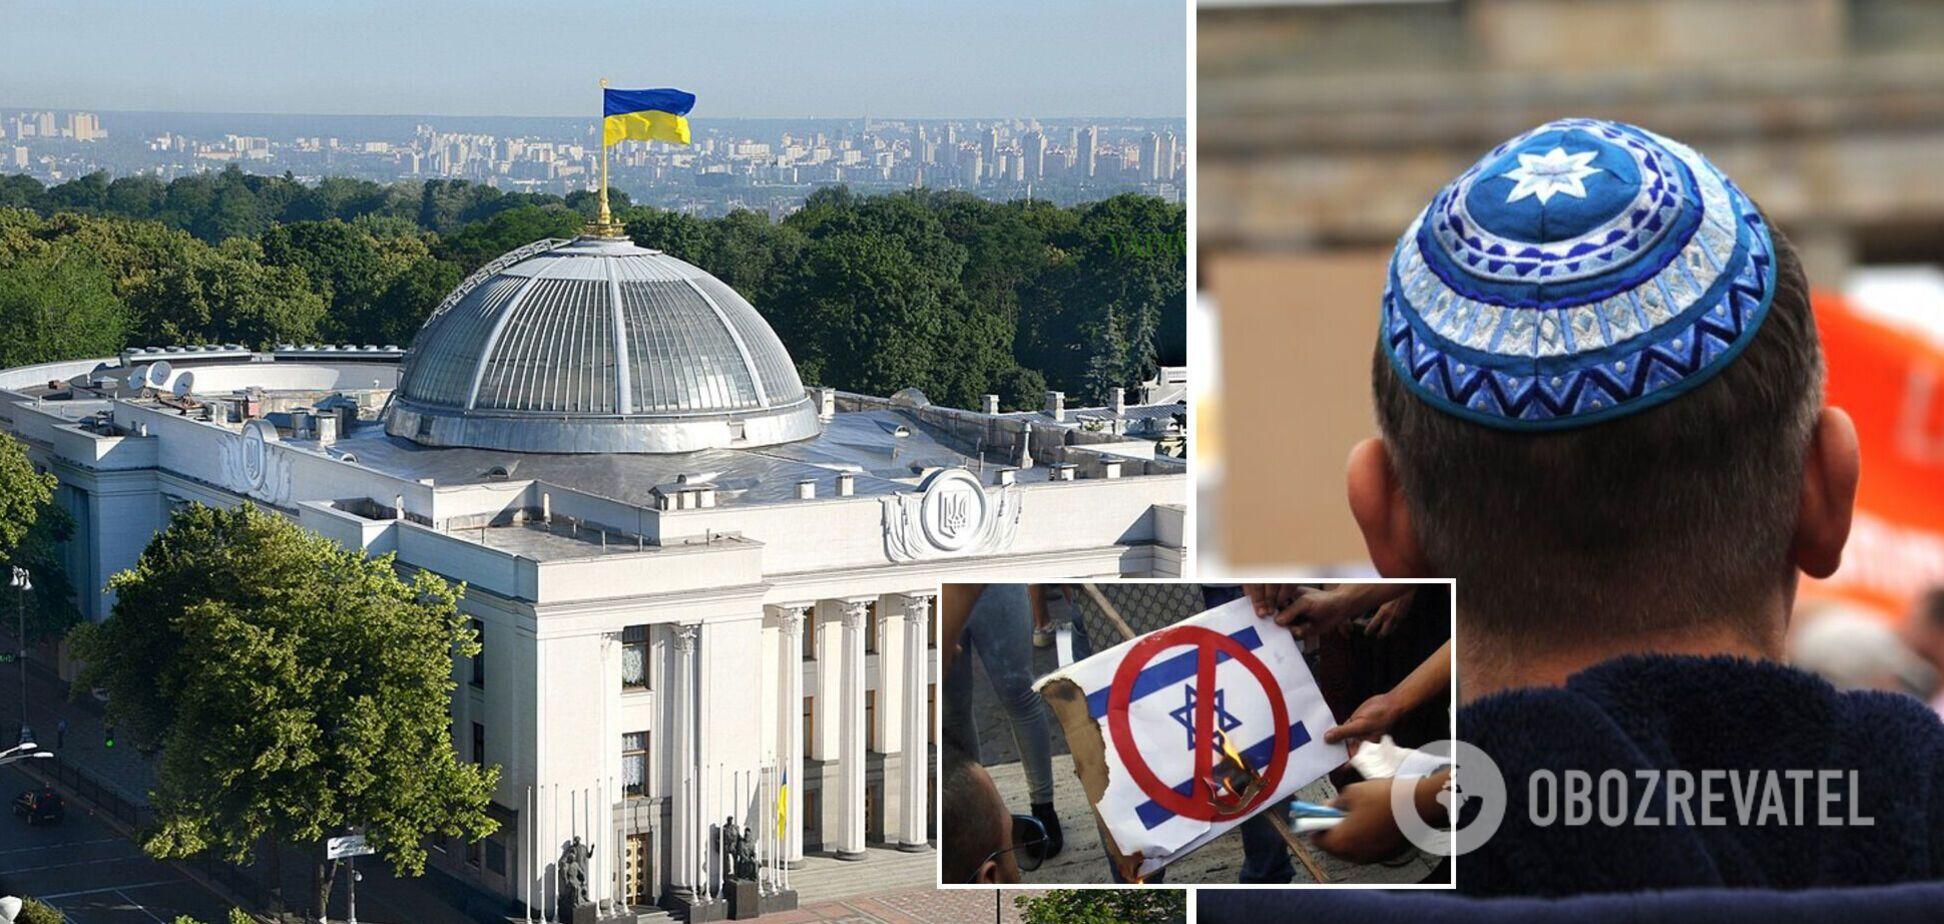 В Раде предложили сажать на 3 года за антисемитизм